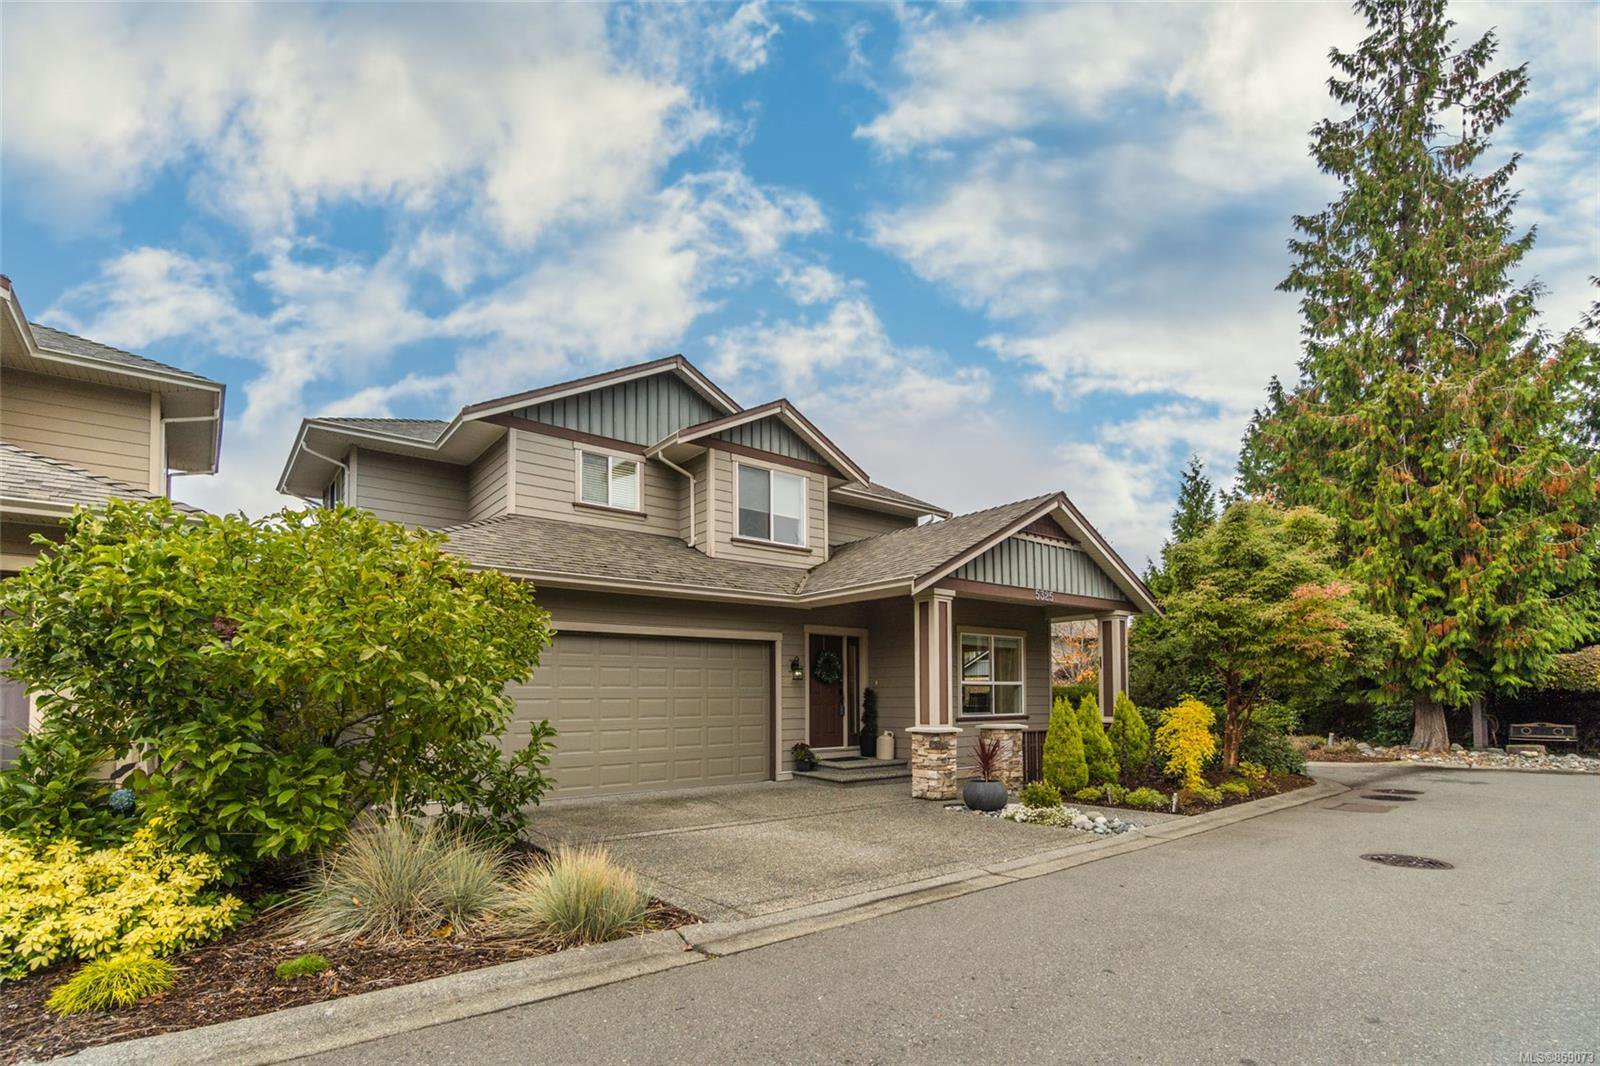 Main Photo: 5325 Katsura Lane in : Na North Nanaimo House for sale (Nanaimo)  : MLS®# 859073